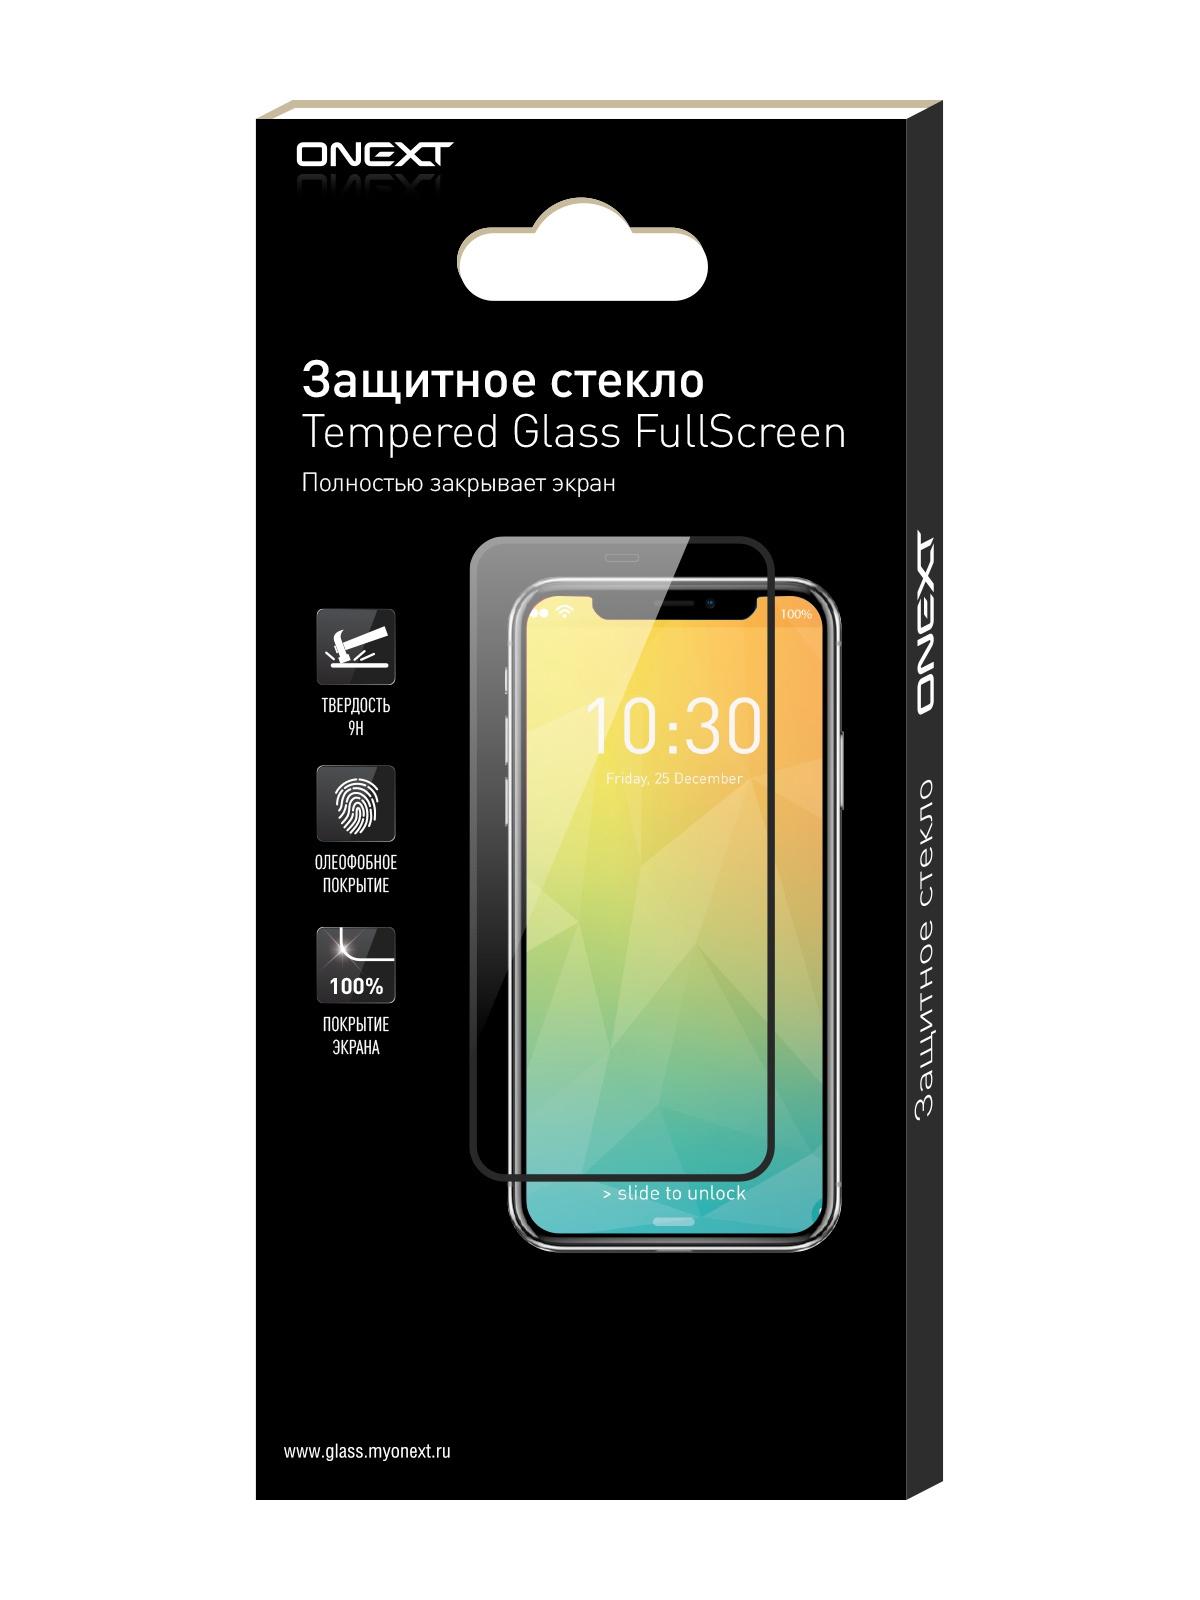 Защитное стекло ONEXT Samsung Galaxy A5 2016 с рамкой цена и фото